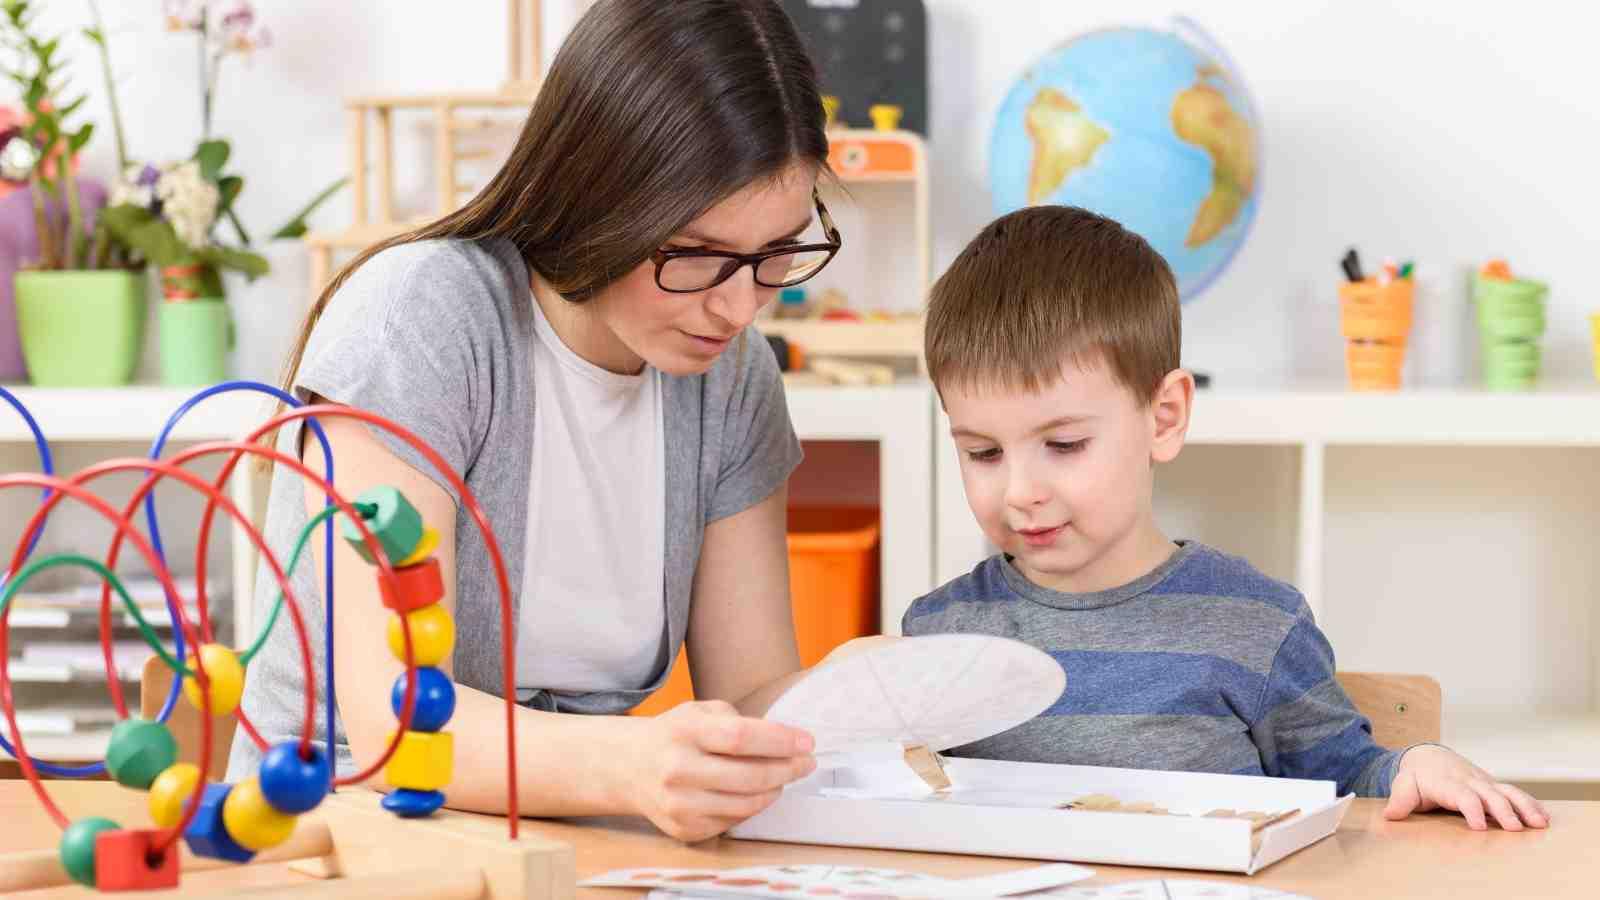 School teacher with child investigating puzzles